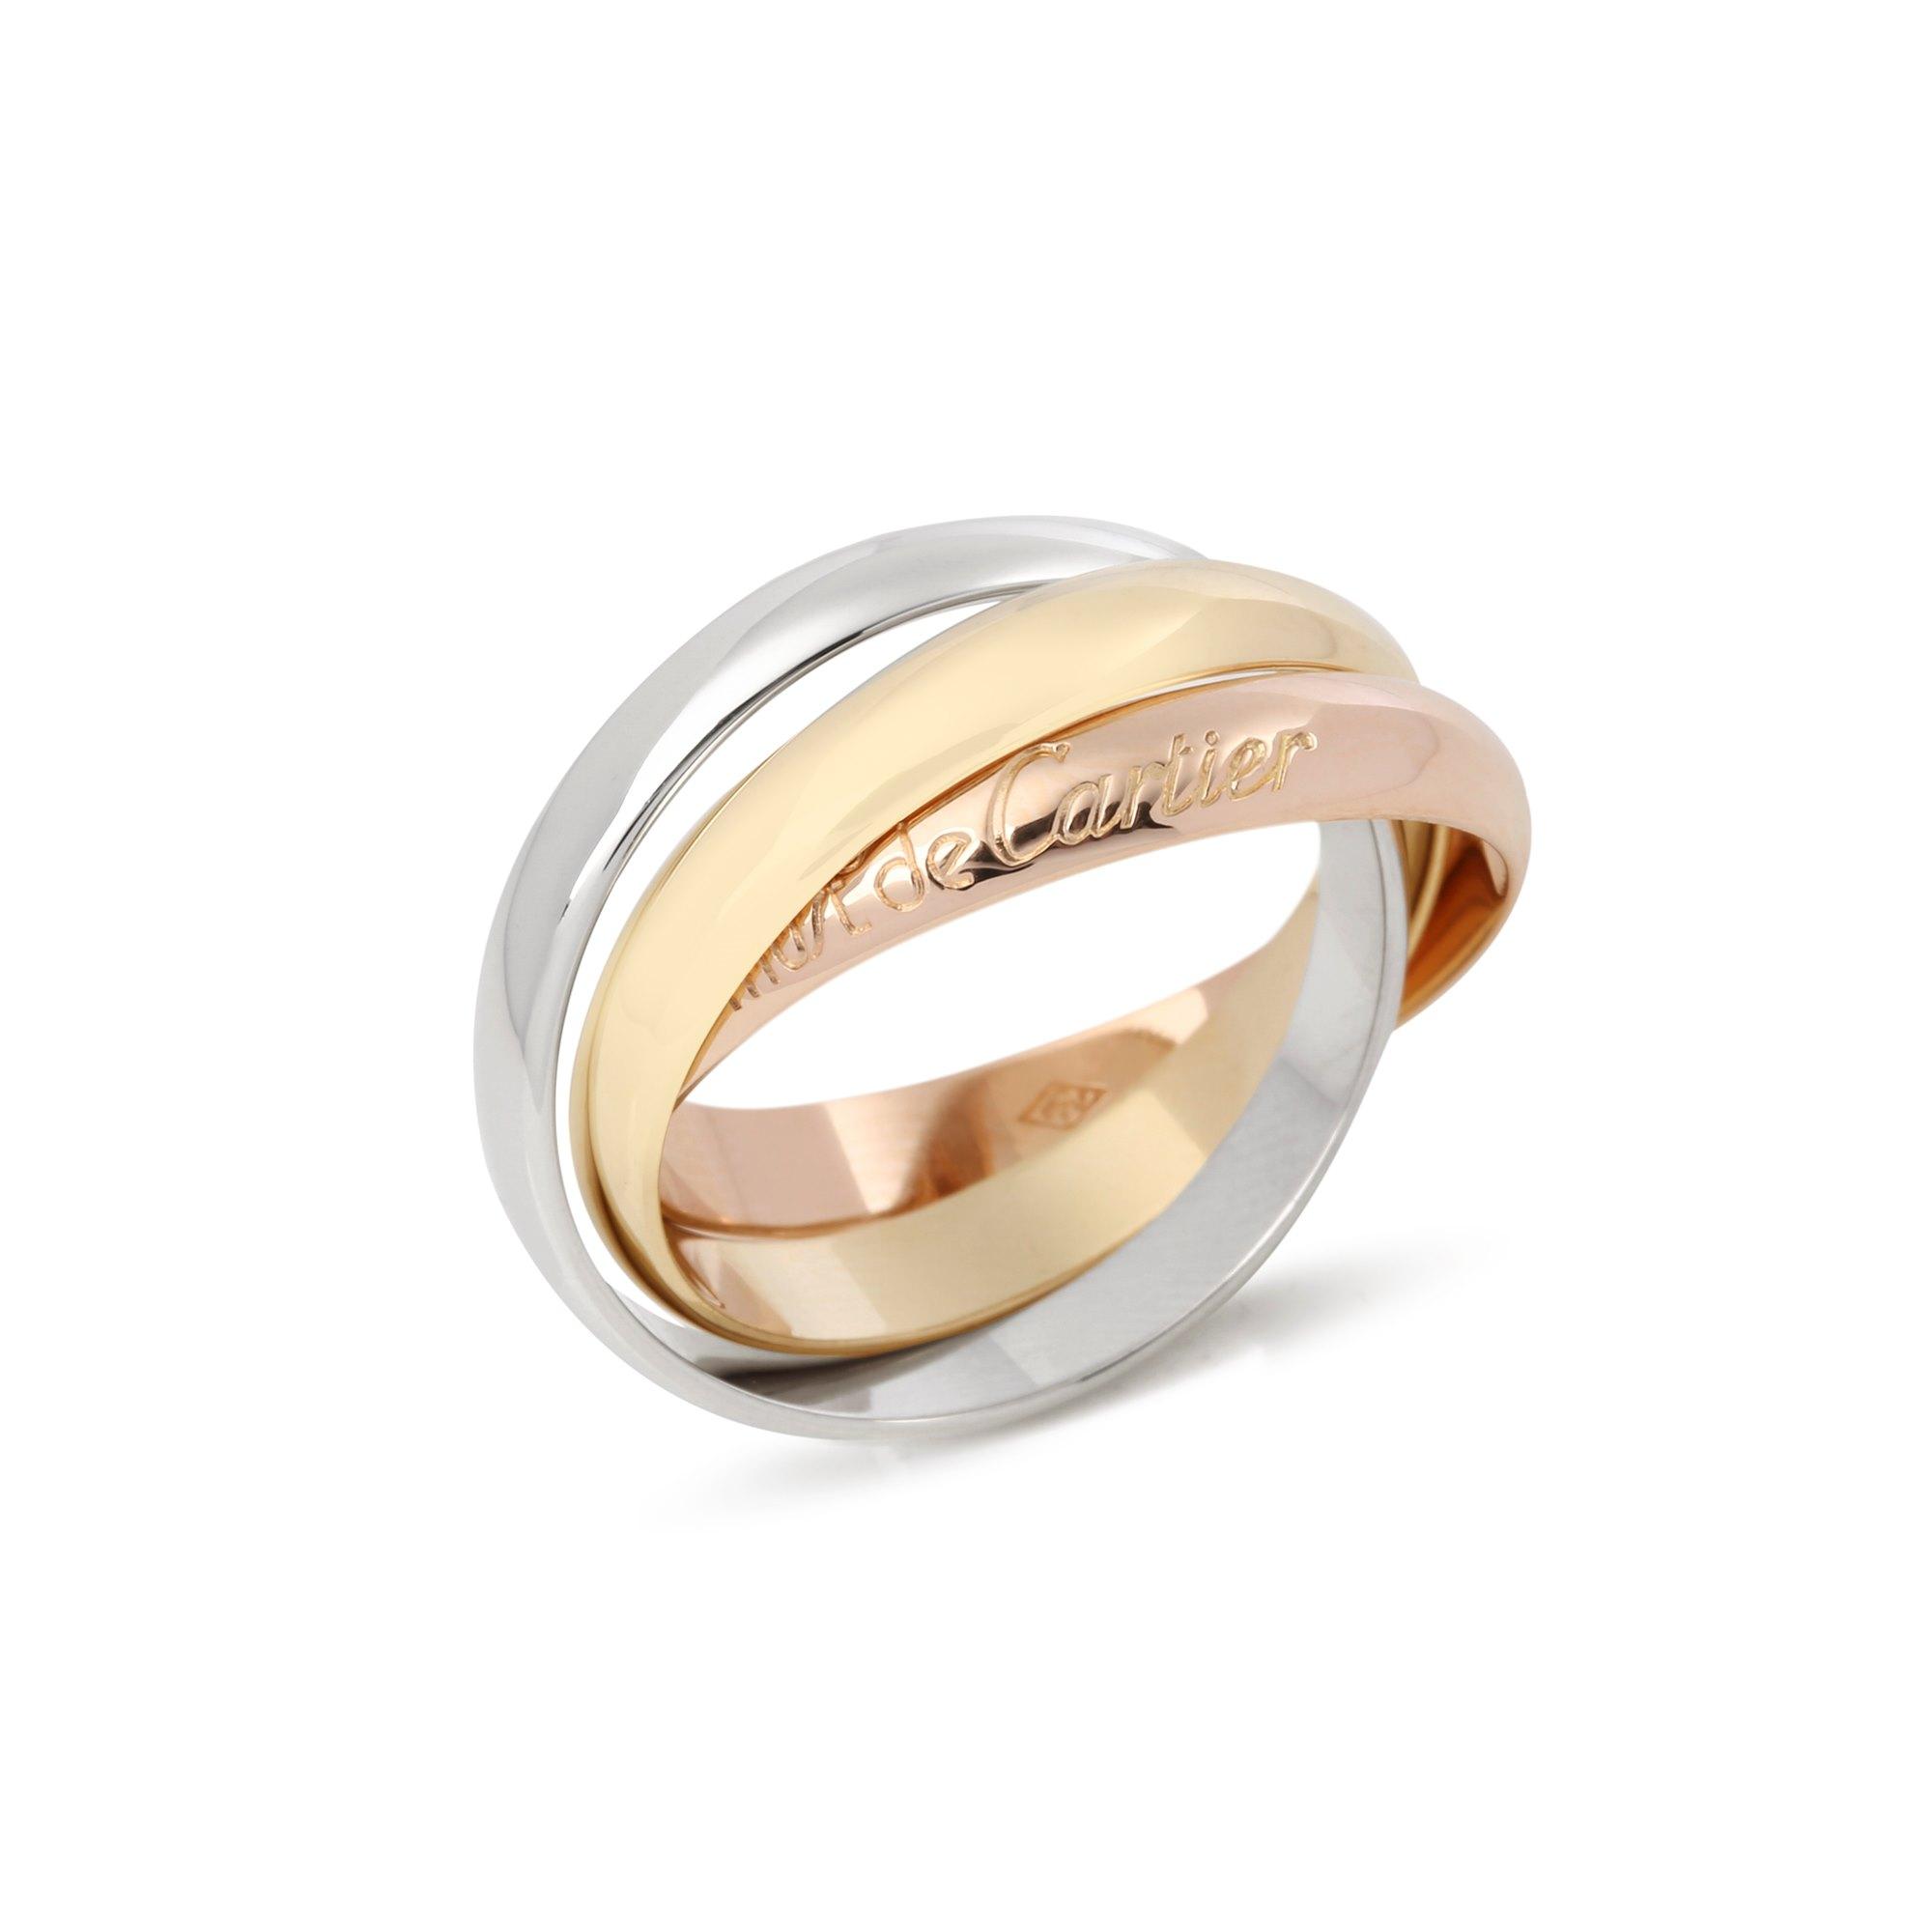 Cartier Les Must de Cartier Trinity Ring